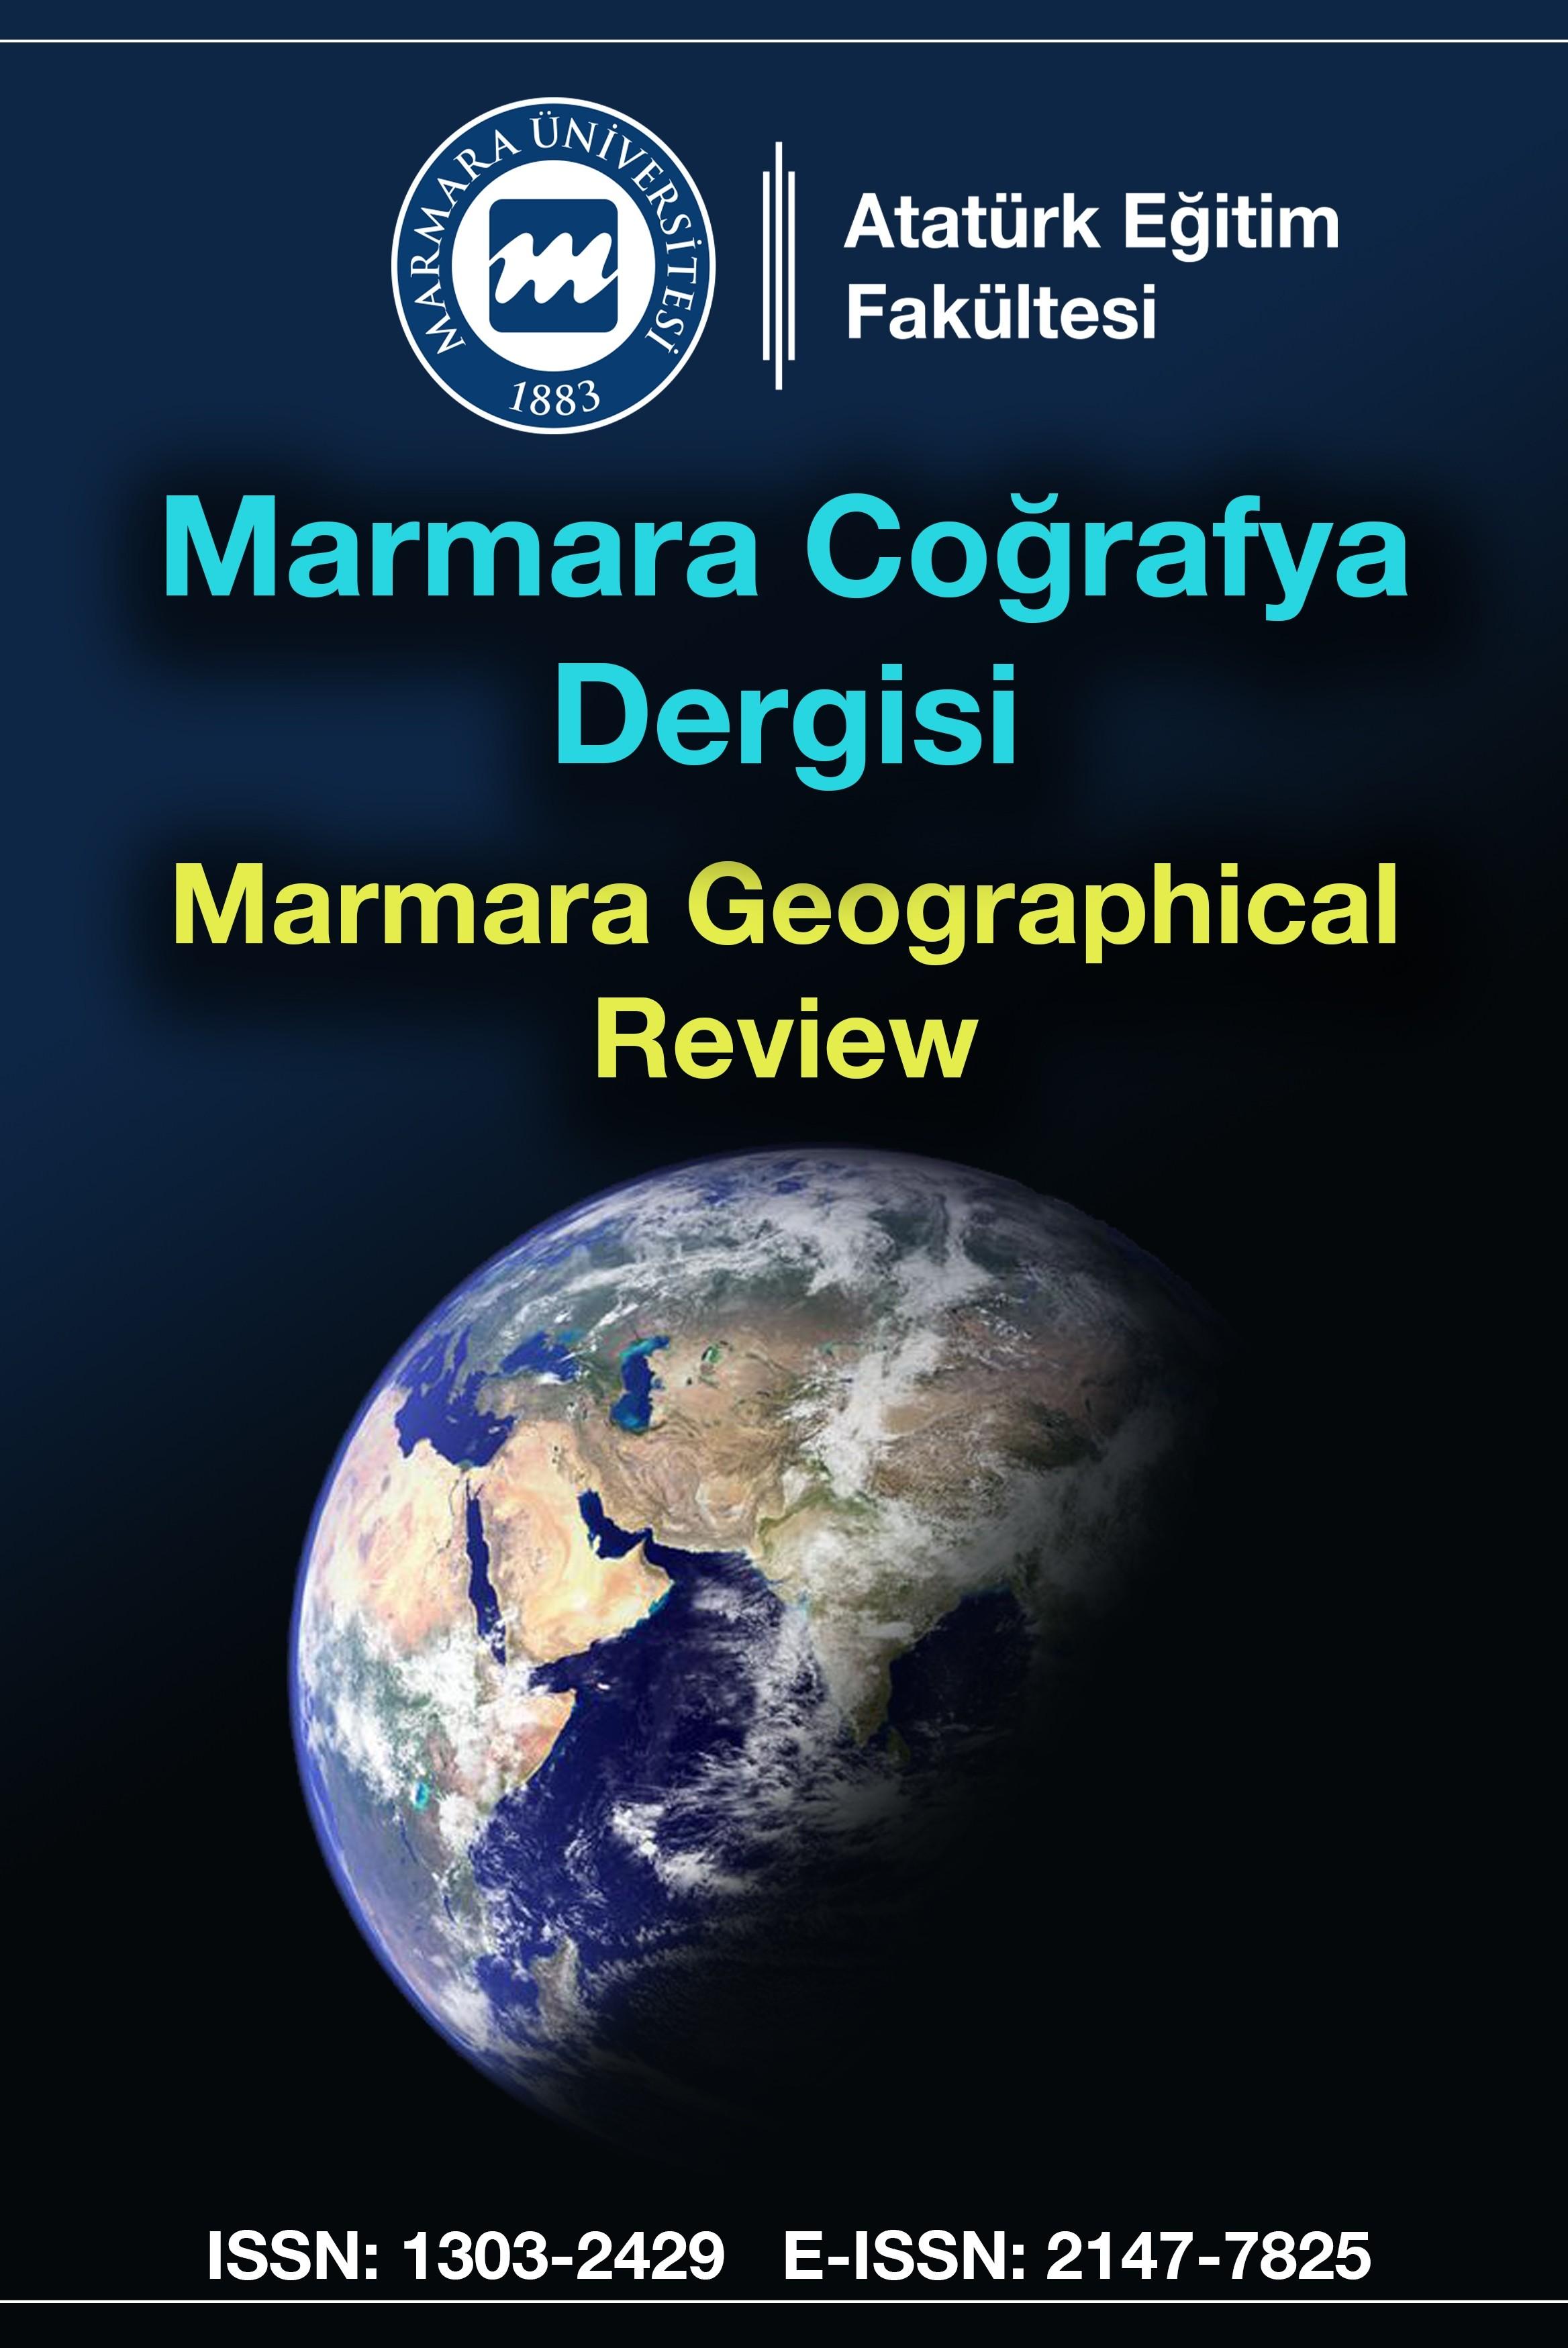 Marmara Coğrafya Dergisi